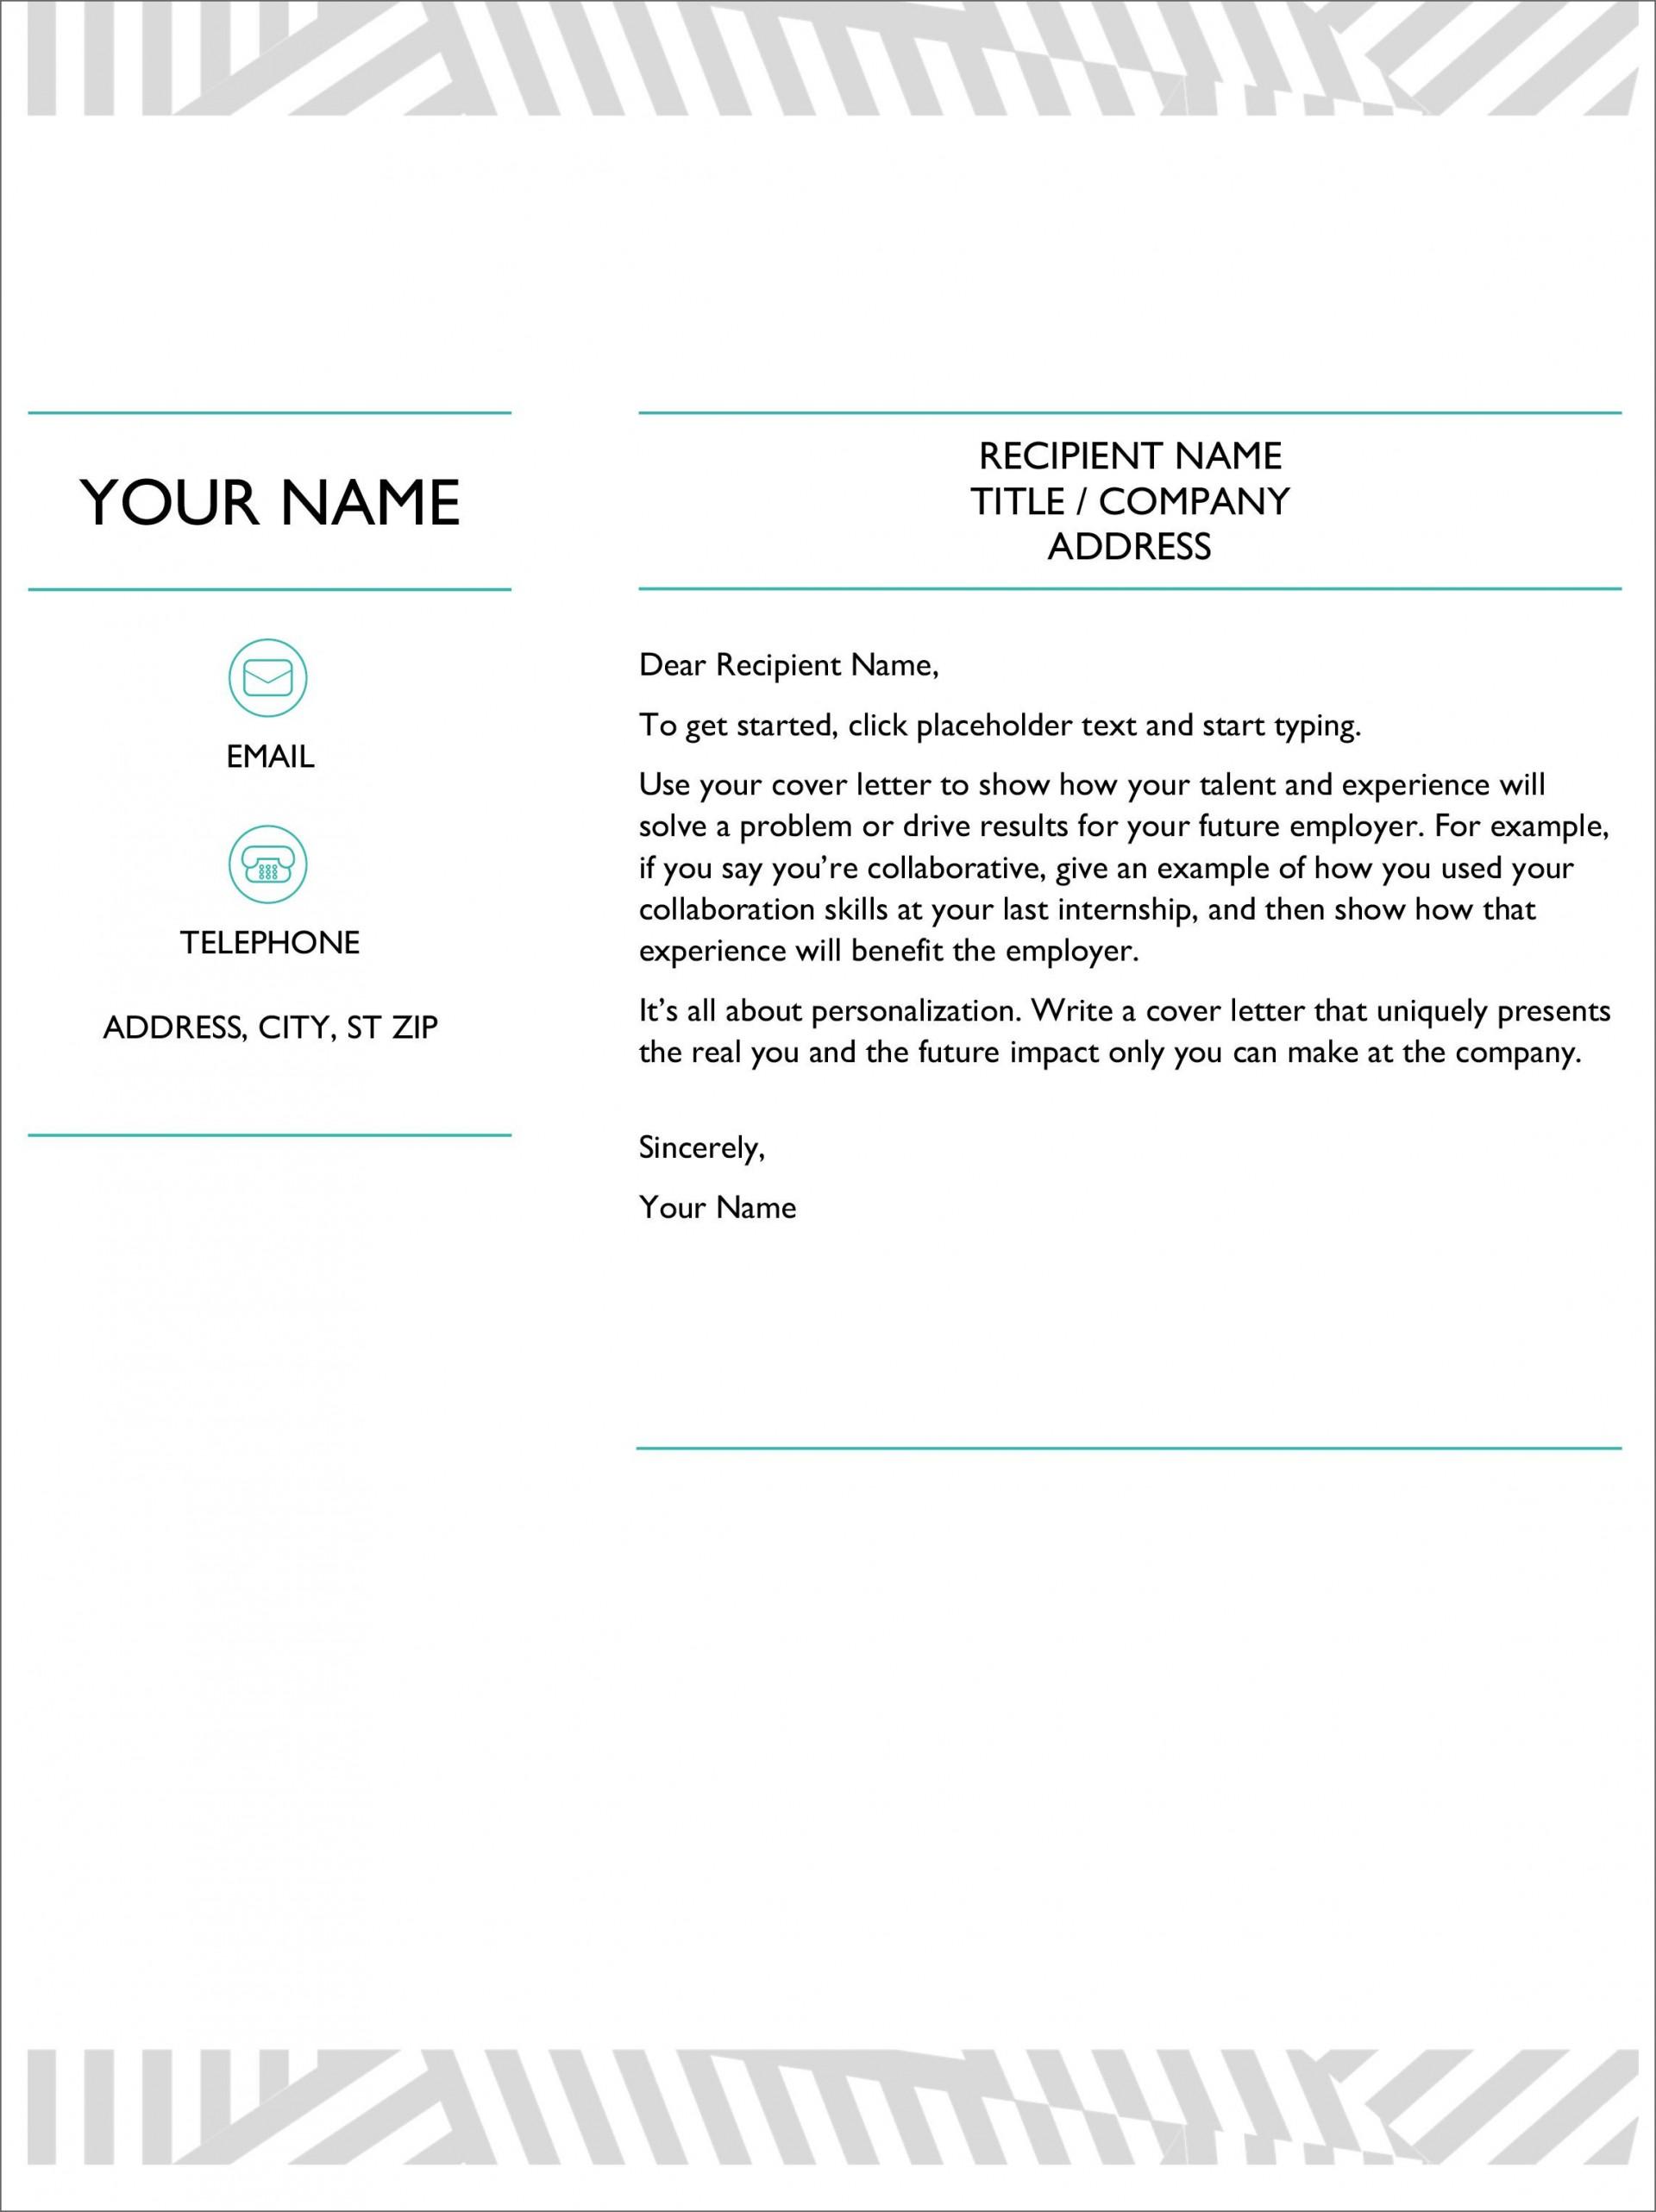 005 Impressive Google Doc Cover Letter Template Inspiration  Swis Free Reddit1920